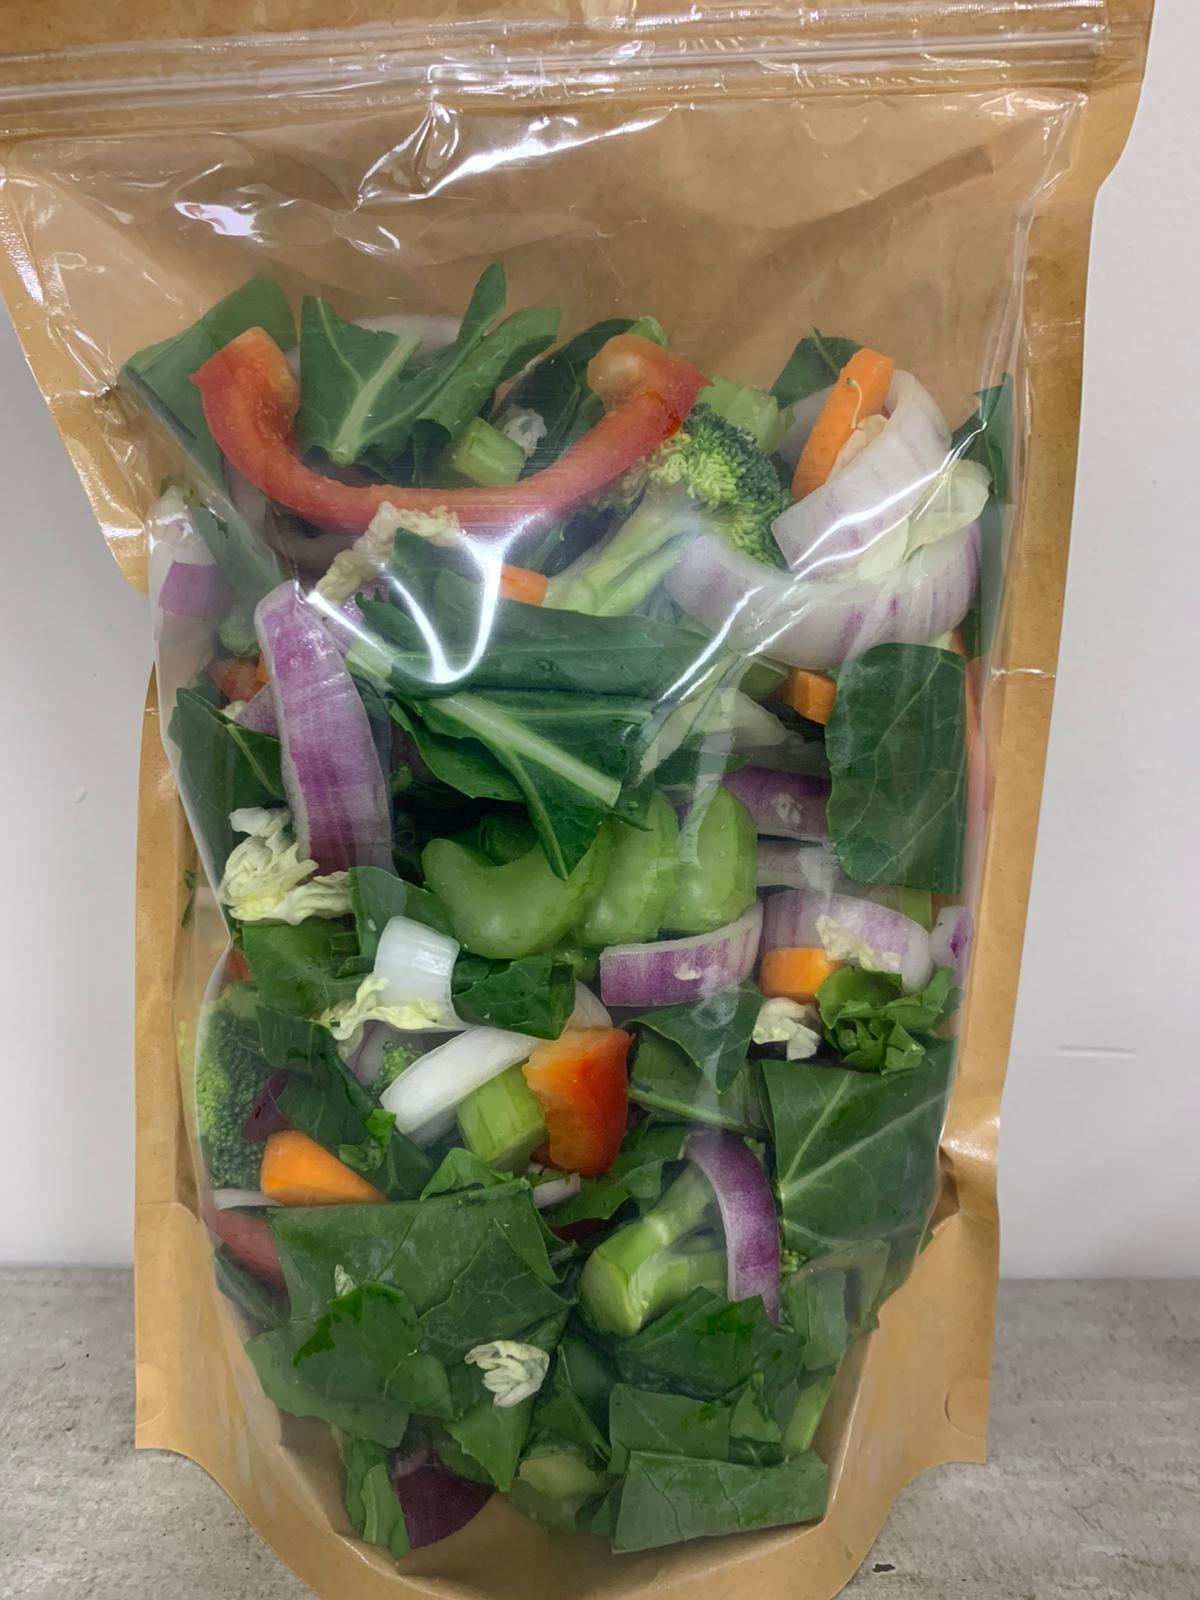 Asian Stir Fry Mix 600gm Bag (Serves 2-4)